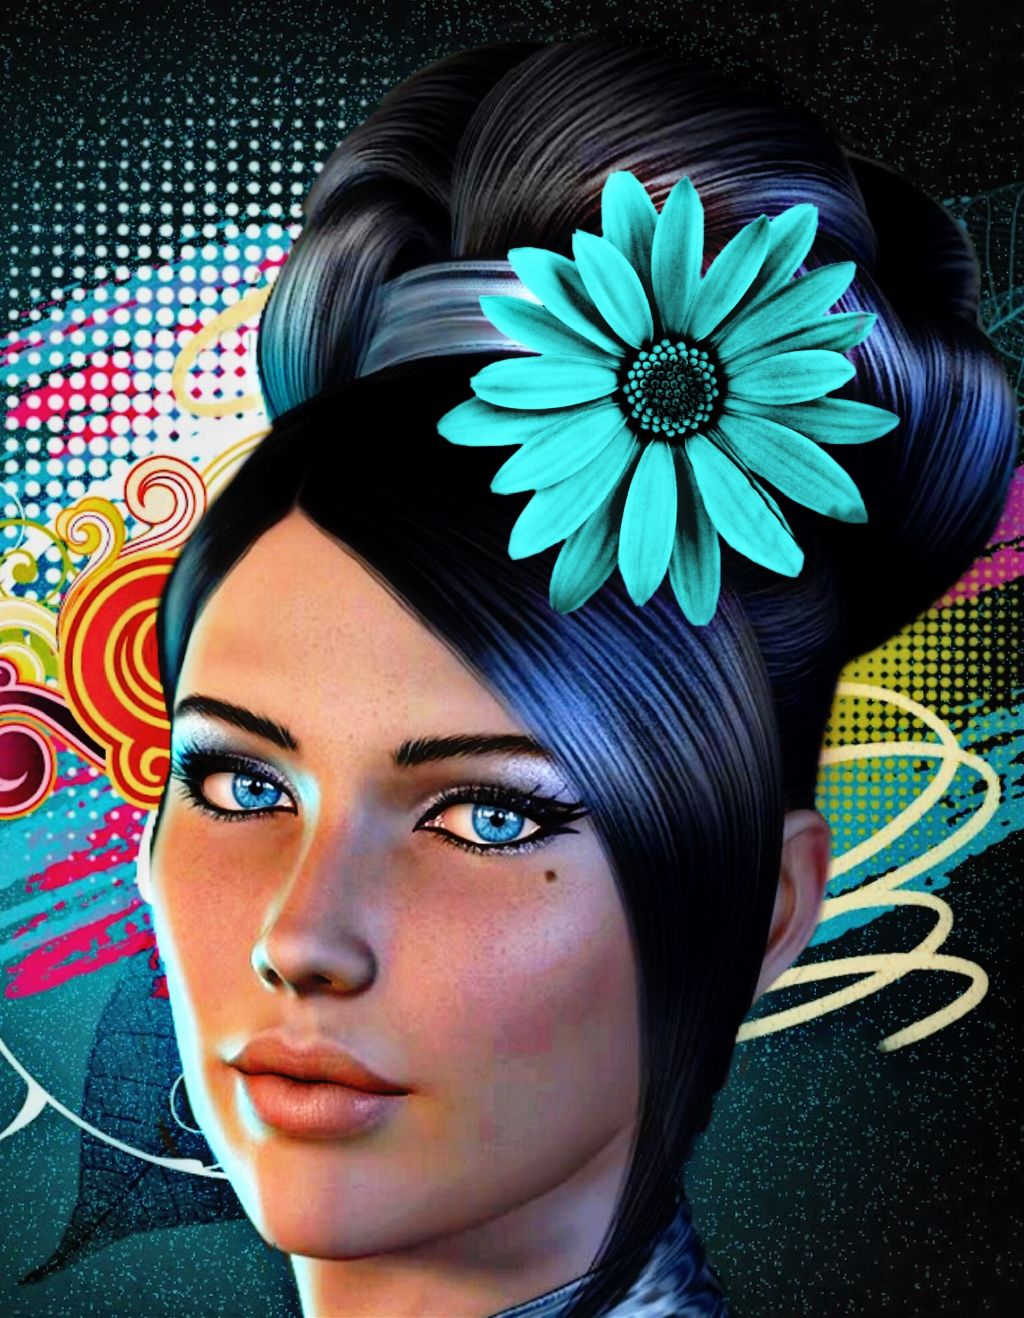 #freetoedit #woman #flower #colorfulbackground